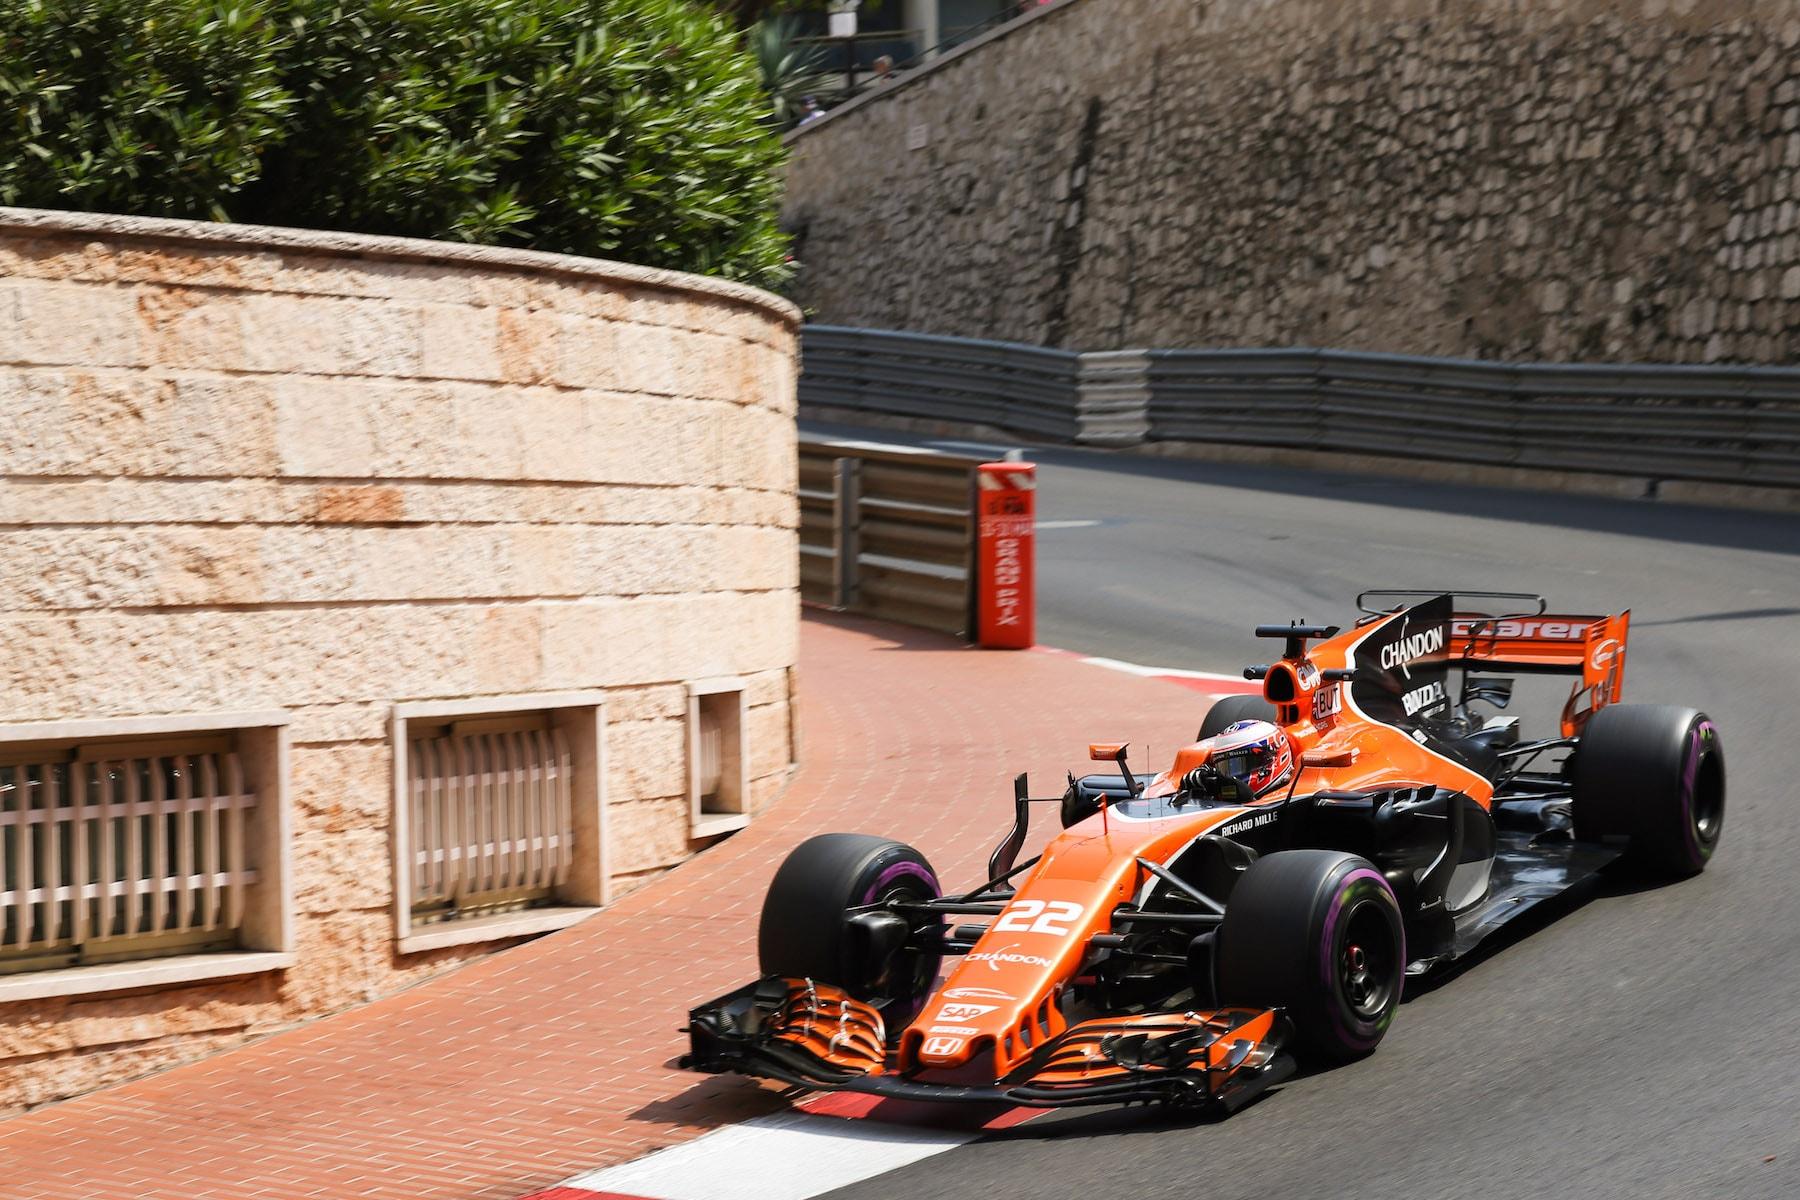 G 2017 Jenson Button | McLaren MCL32 | 2017 Monaco GP 1 copy.jpg